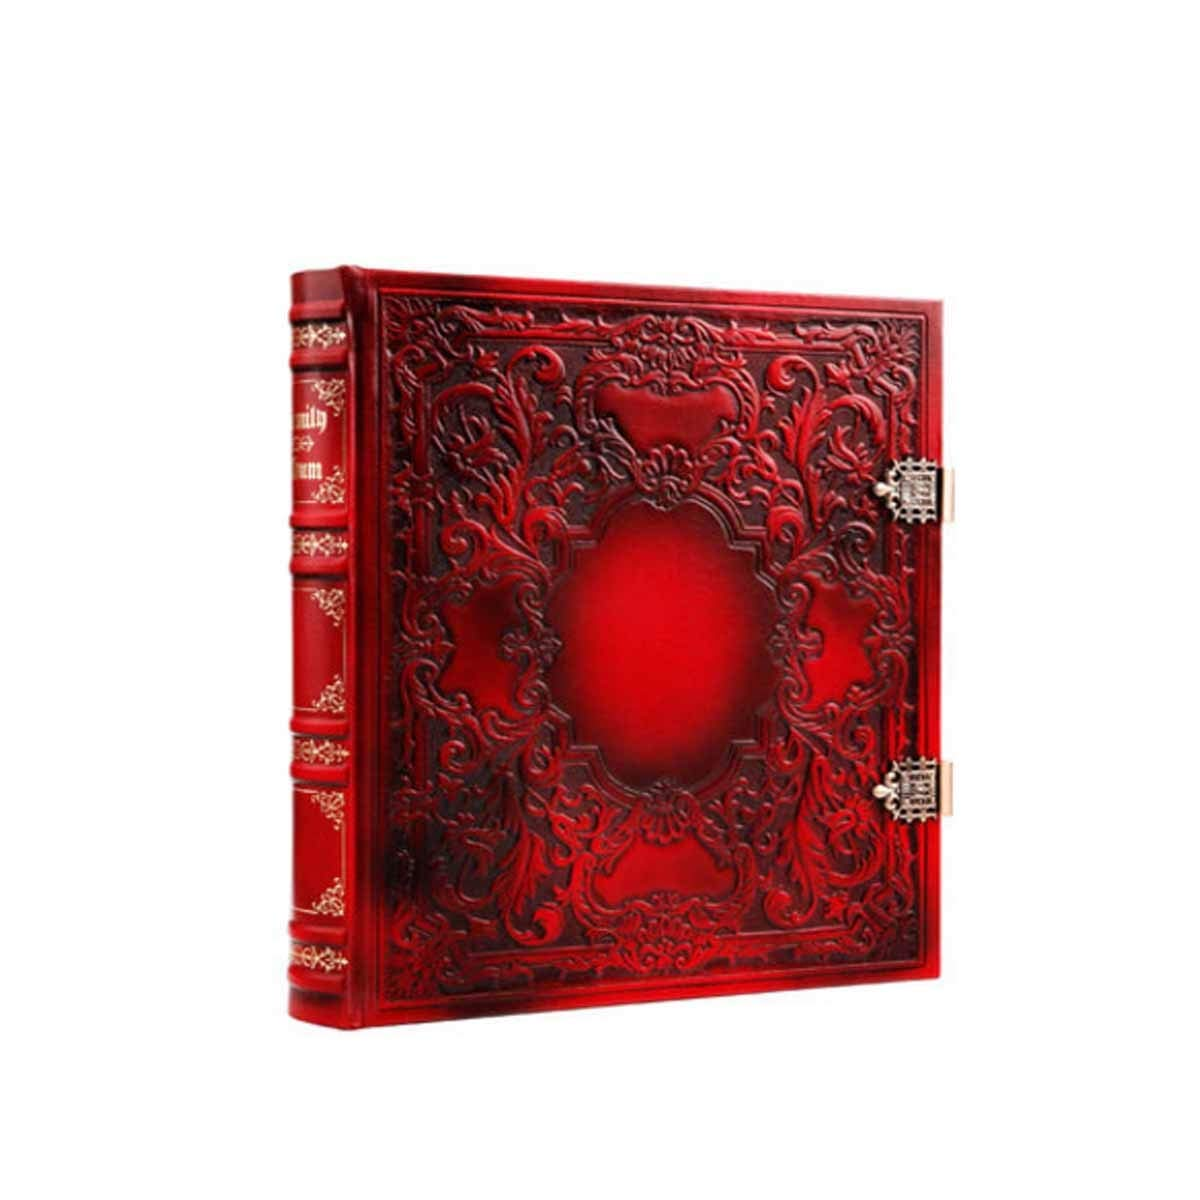 Jiansheng01 Album, Leather Retro Traditional Photo Album, Large Capacity Can Save Longer Paste, Retro Brown, Retro Red Noble Design (Color : Red) by Jiansheng01